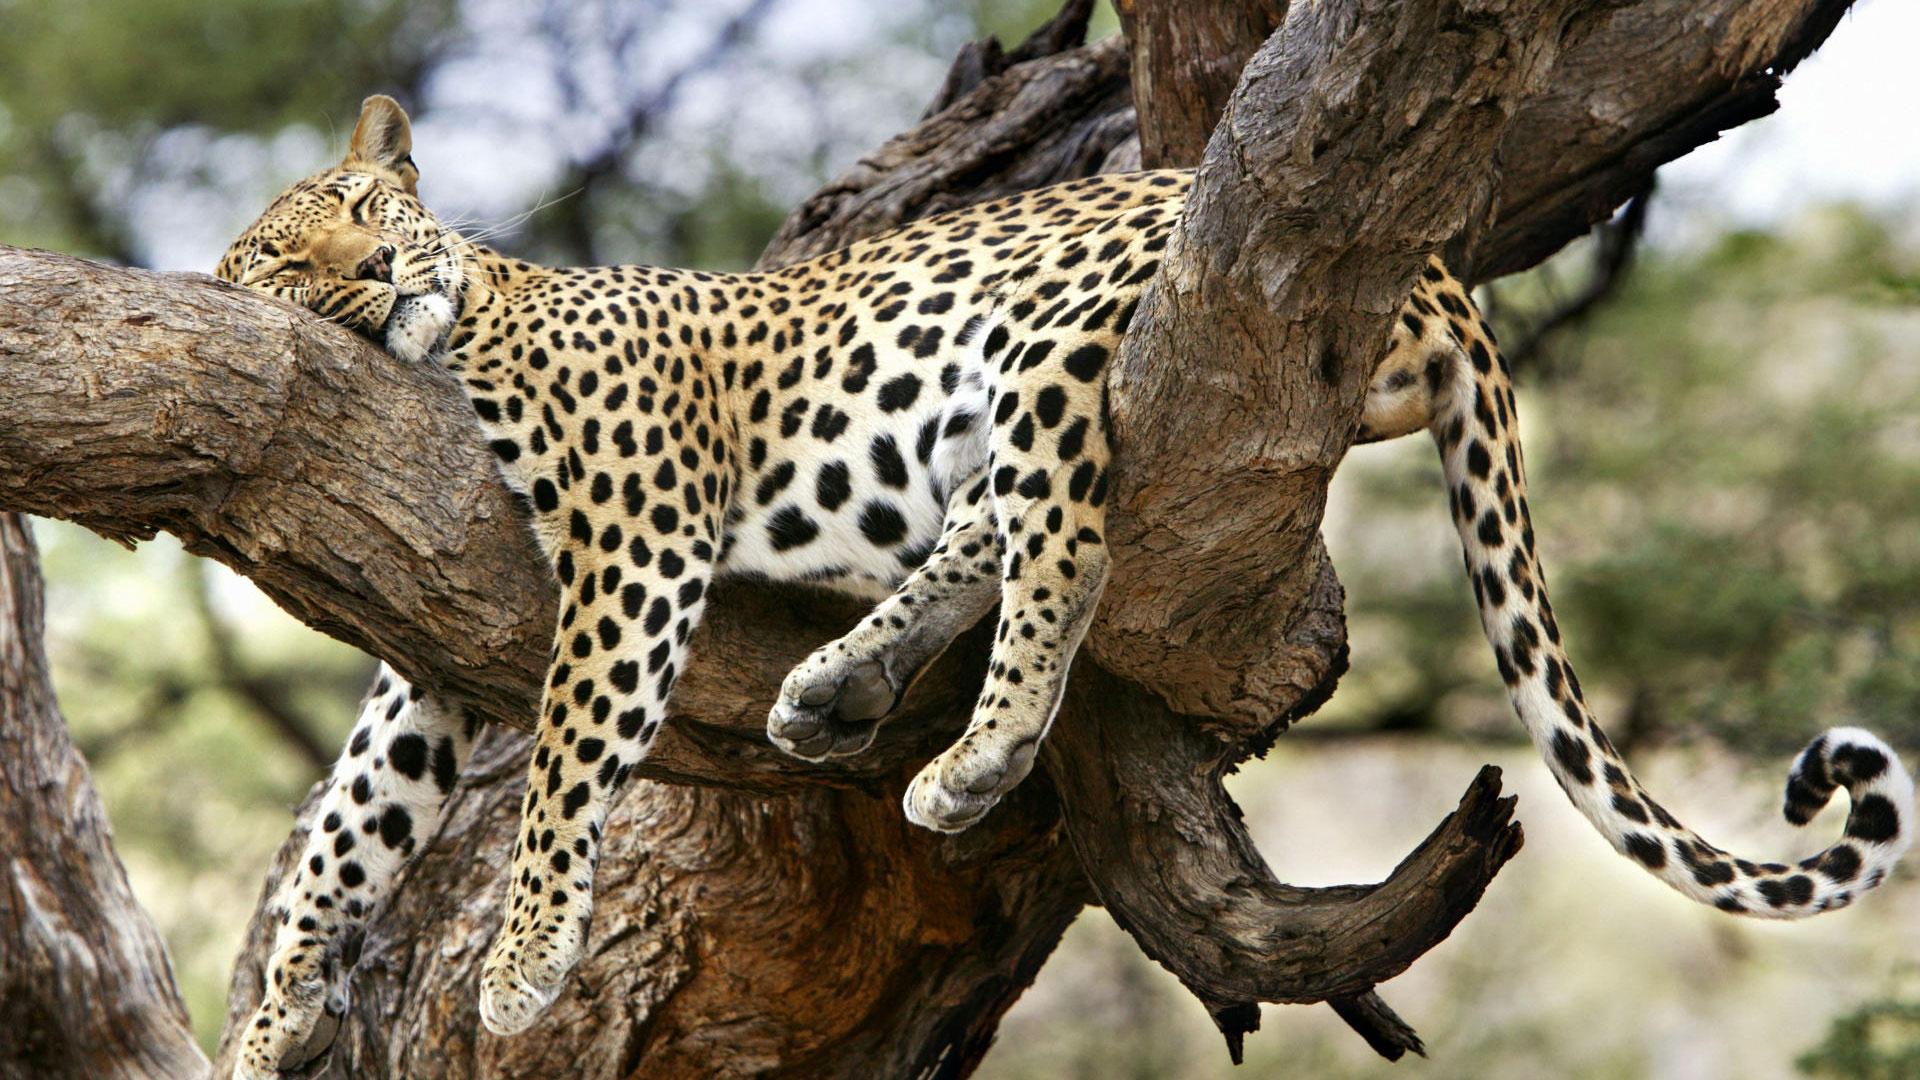 Обои Вода, леопард, дерево, цветы. Разное foto 11